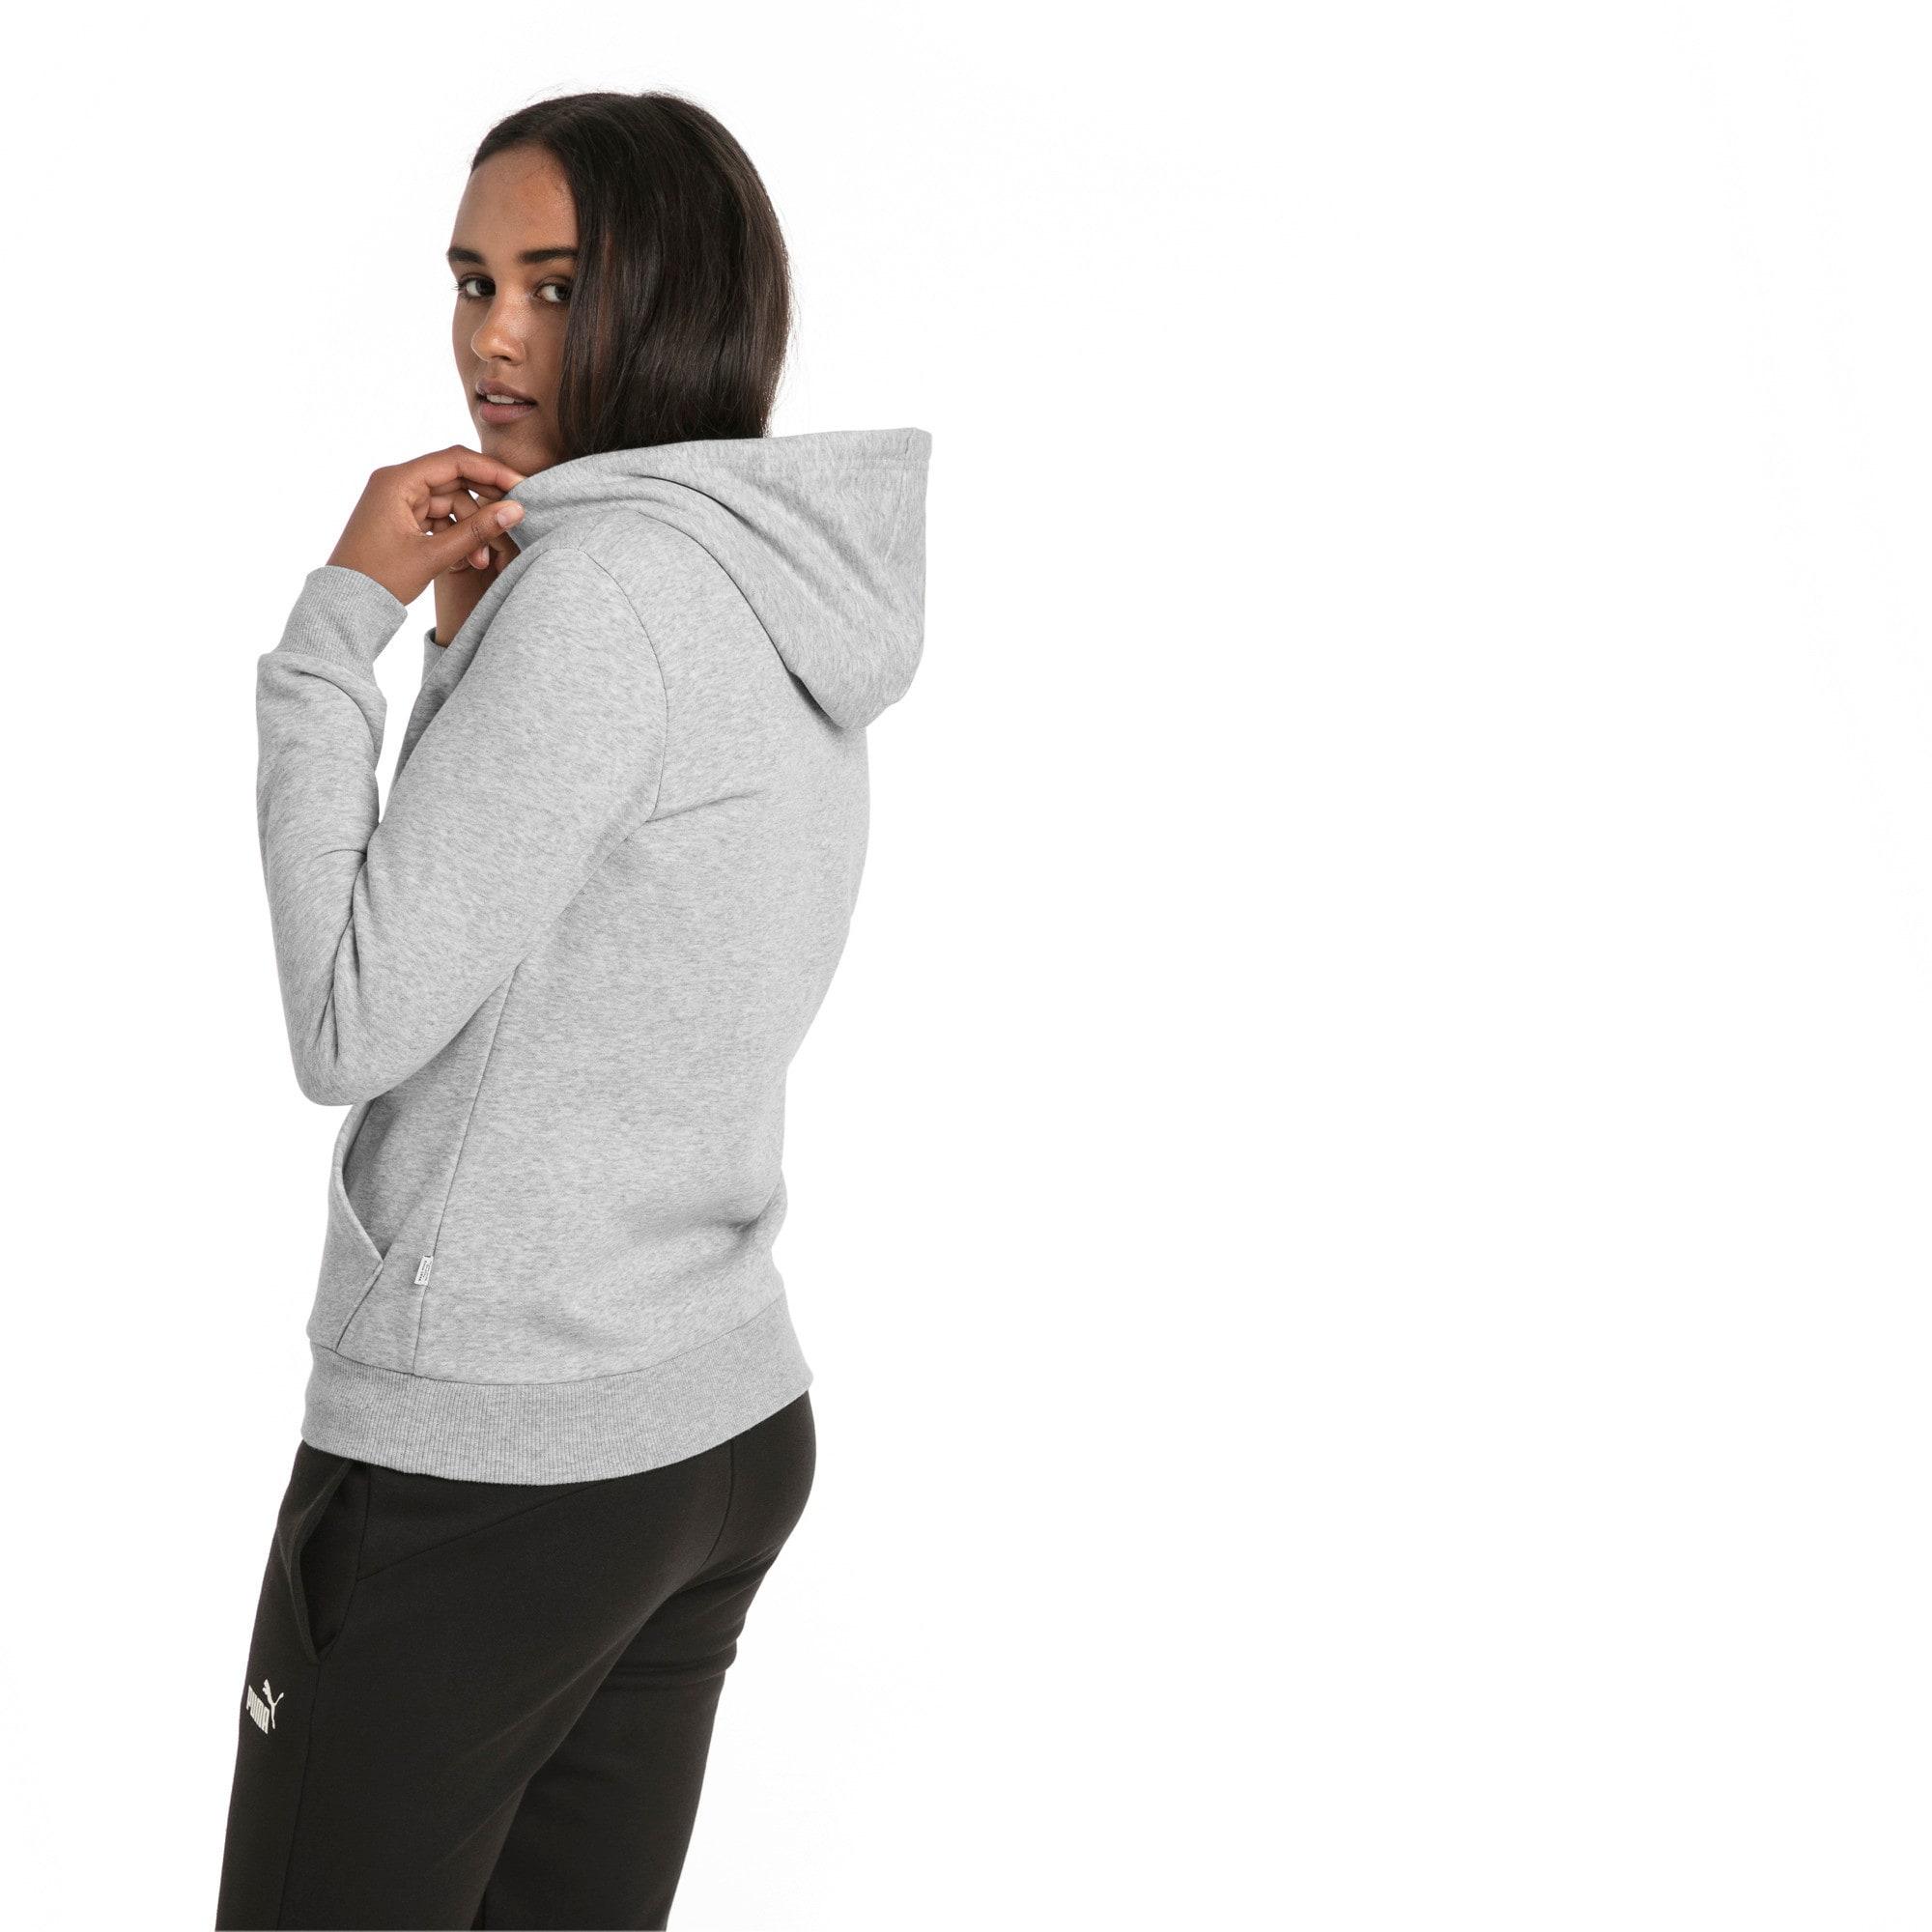 Thumbnail 2 of Essentials Fleece Women's Hoodie, Light Gray Heather, medium